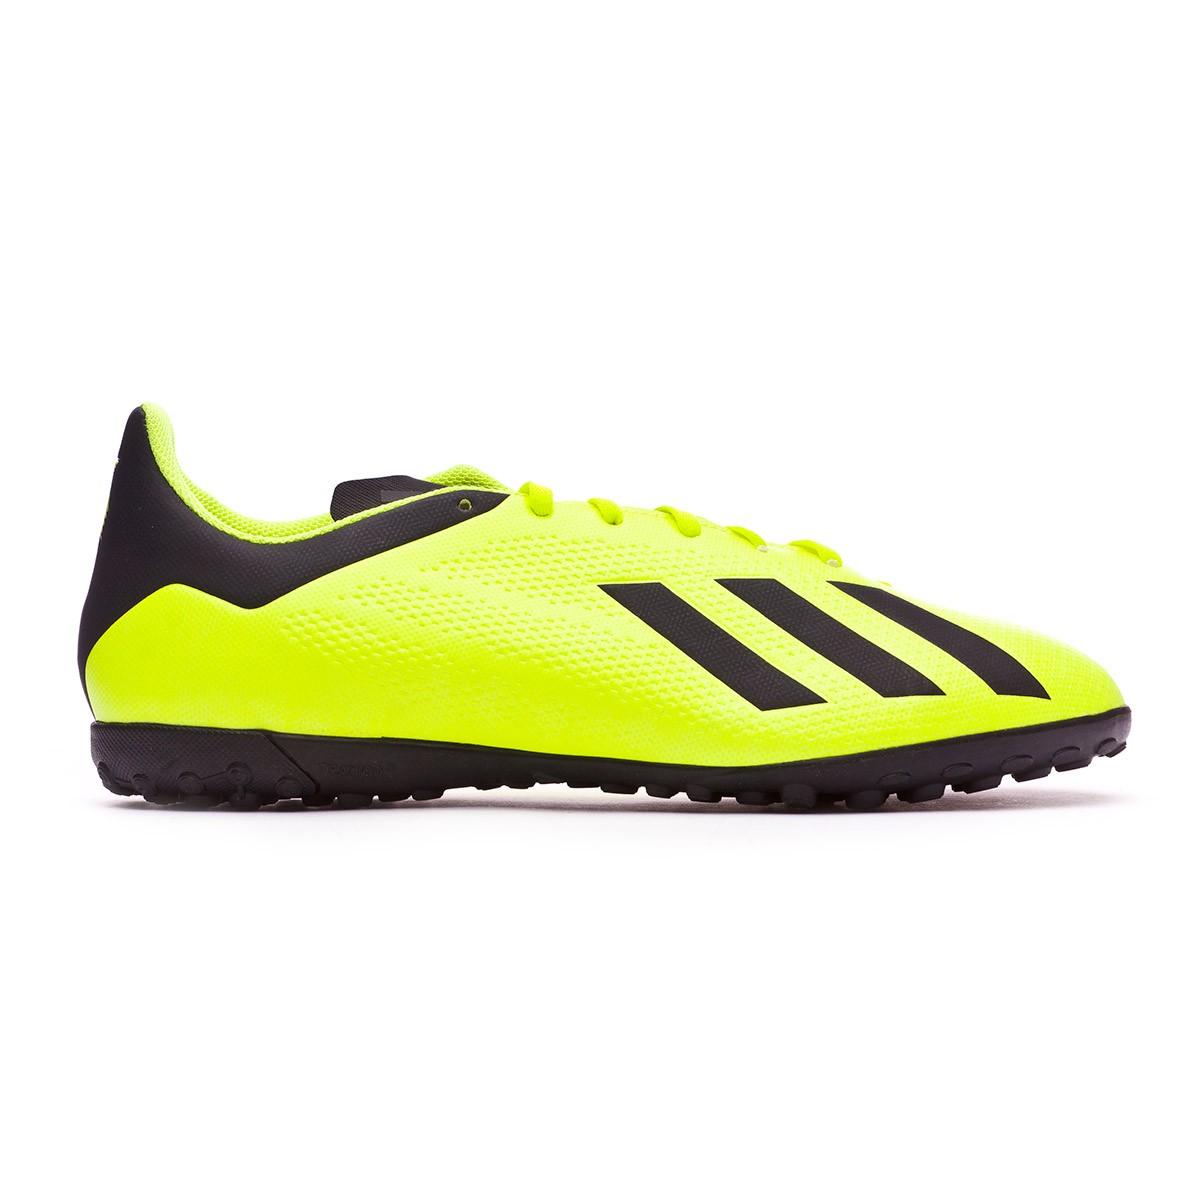 302f8a44f8160 Football Boot adidas X Tango 18.4 Turf Solar yellow-Core black-White -  Football store Fútbol Emotion